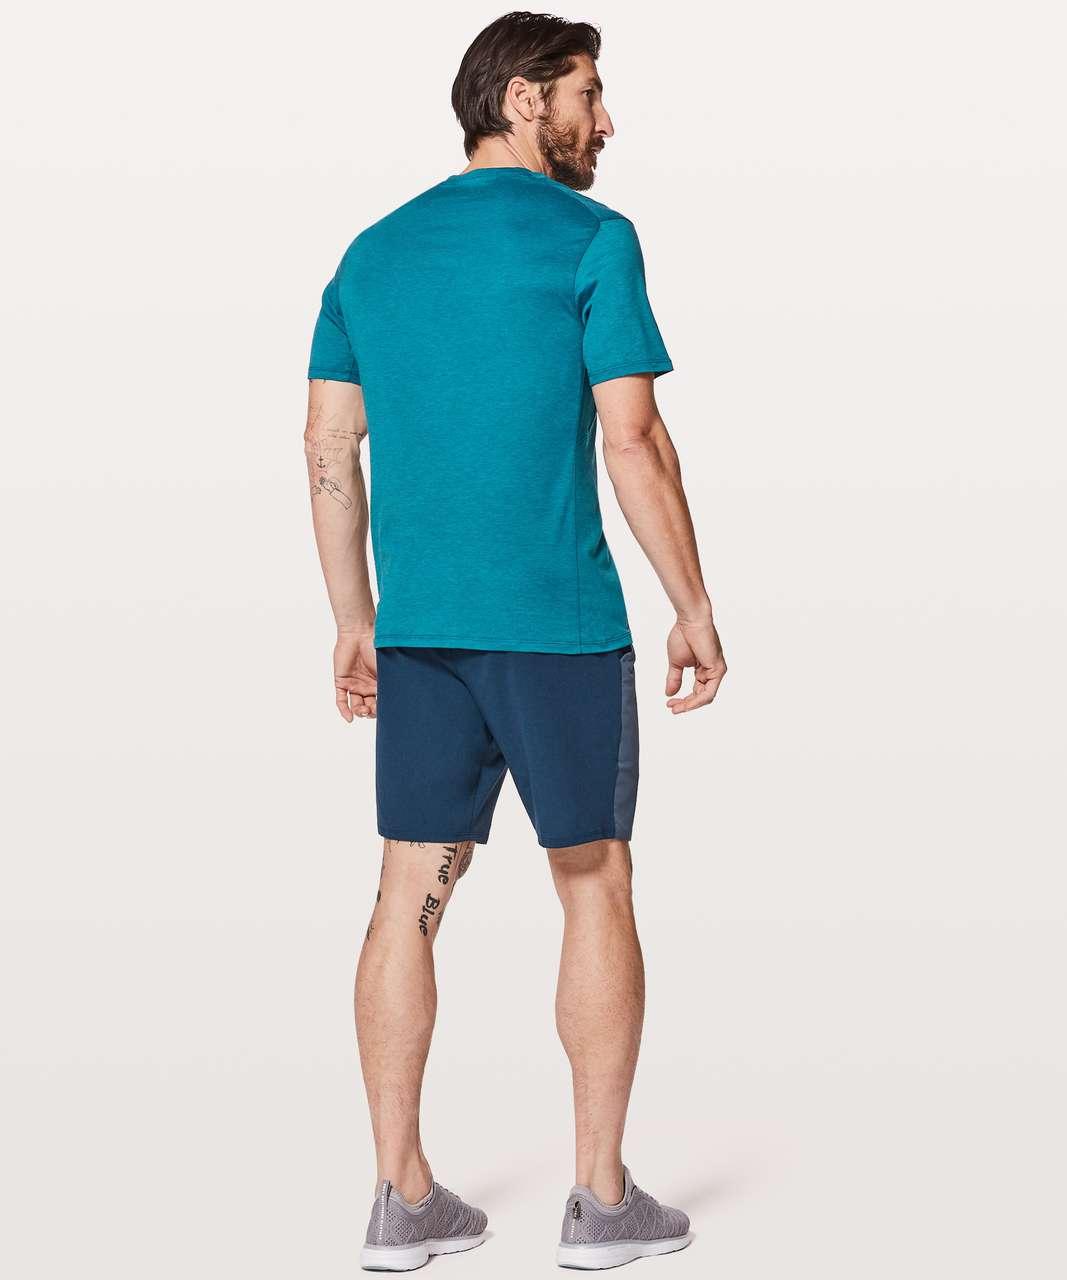 Lululemon Somatic Aero Short Sleeve - Capri